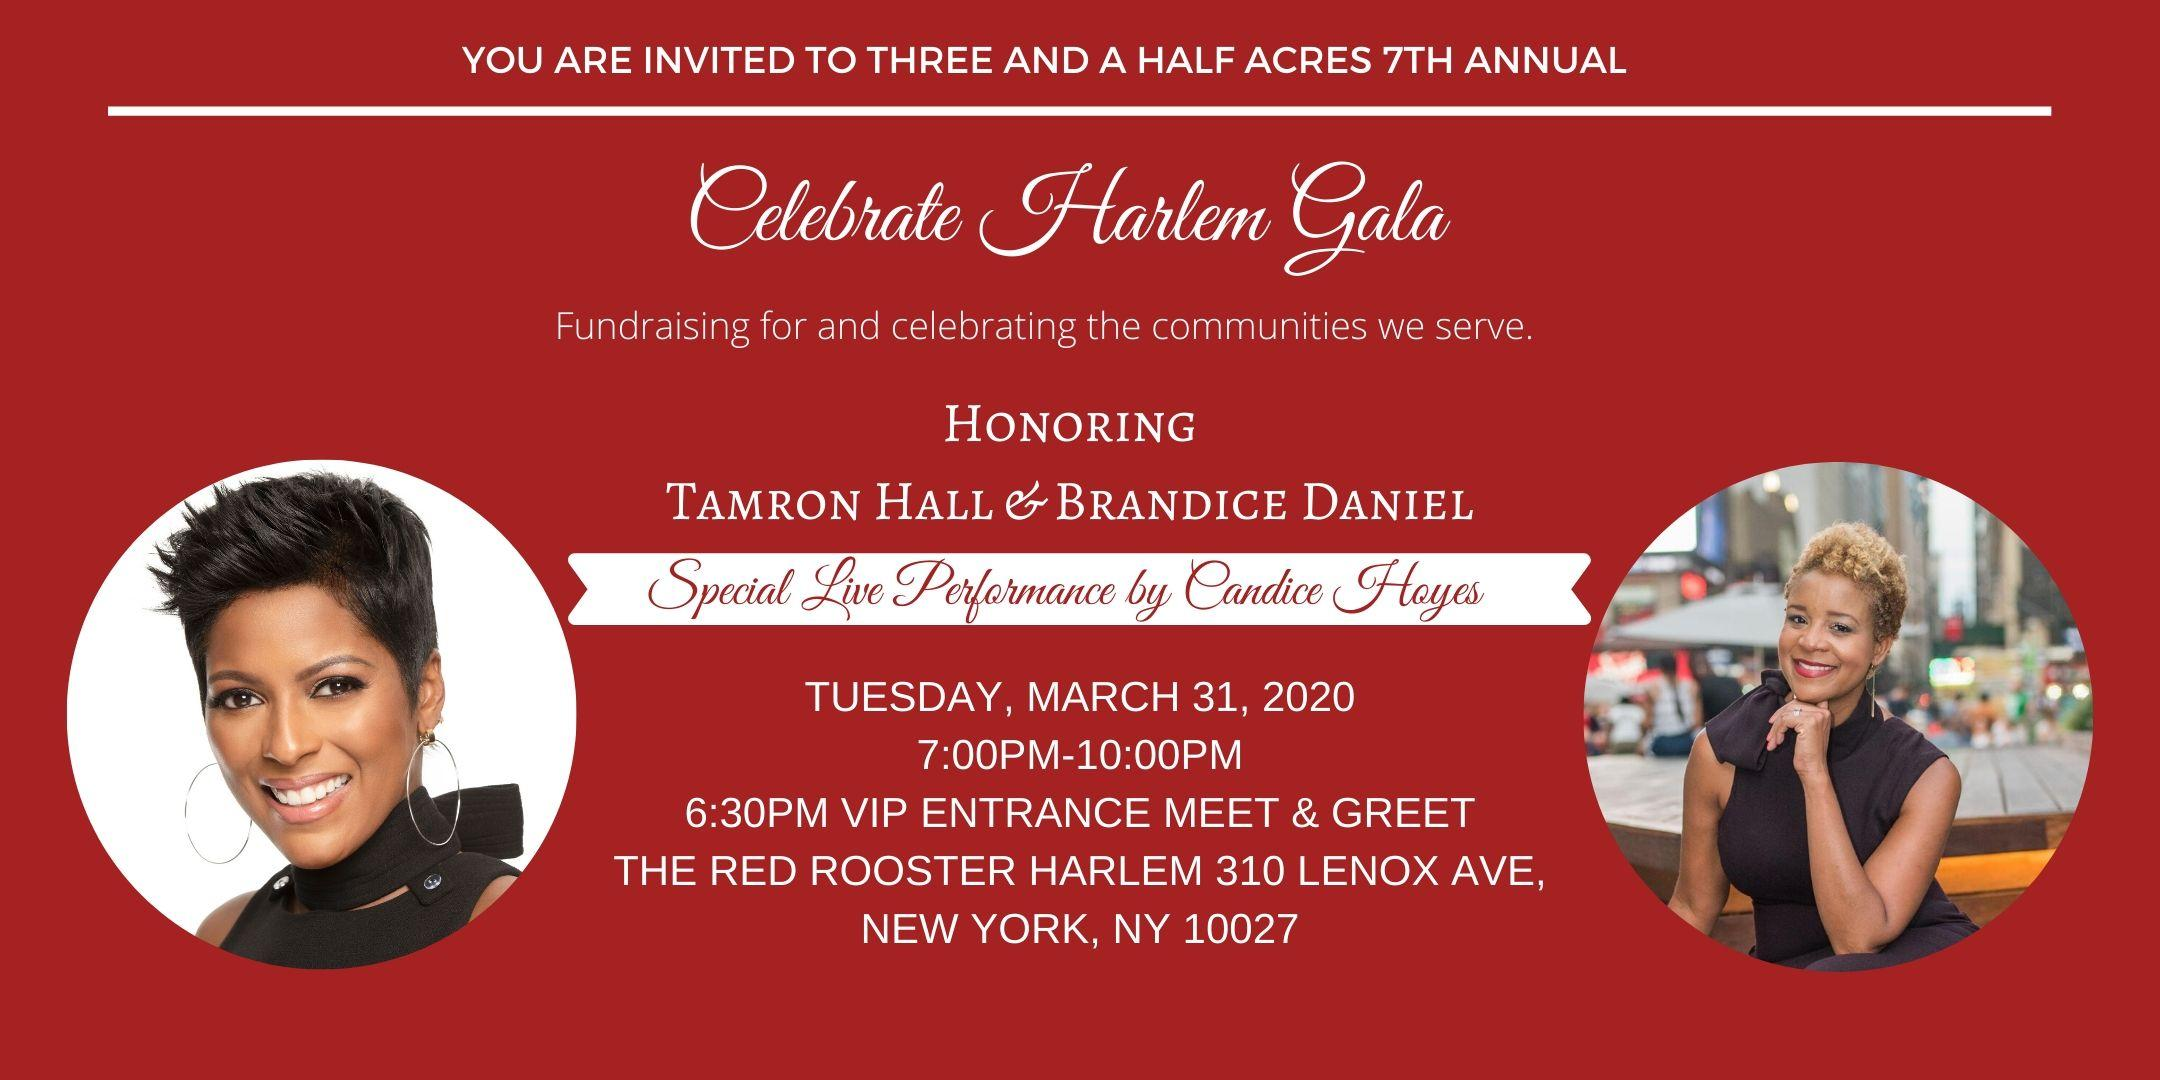 Three and a Half Acres 7th Annual Celebrate Harlem Gala